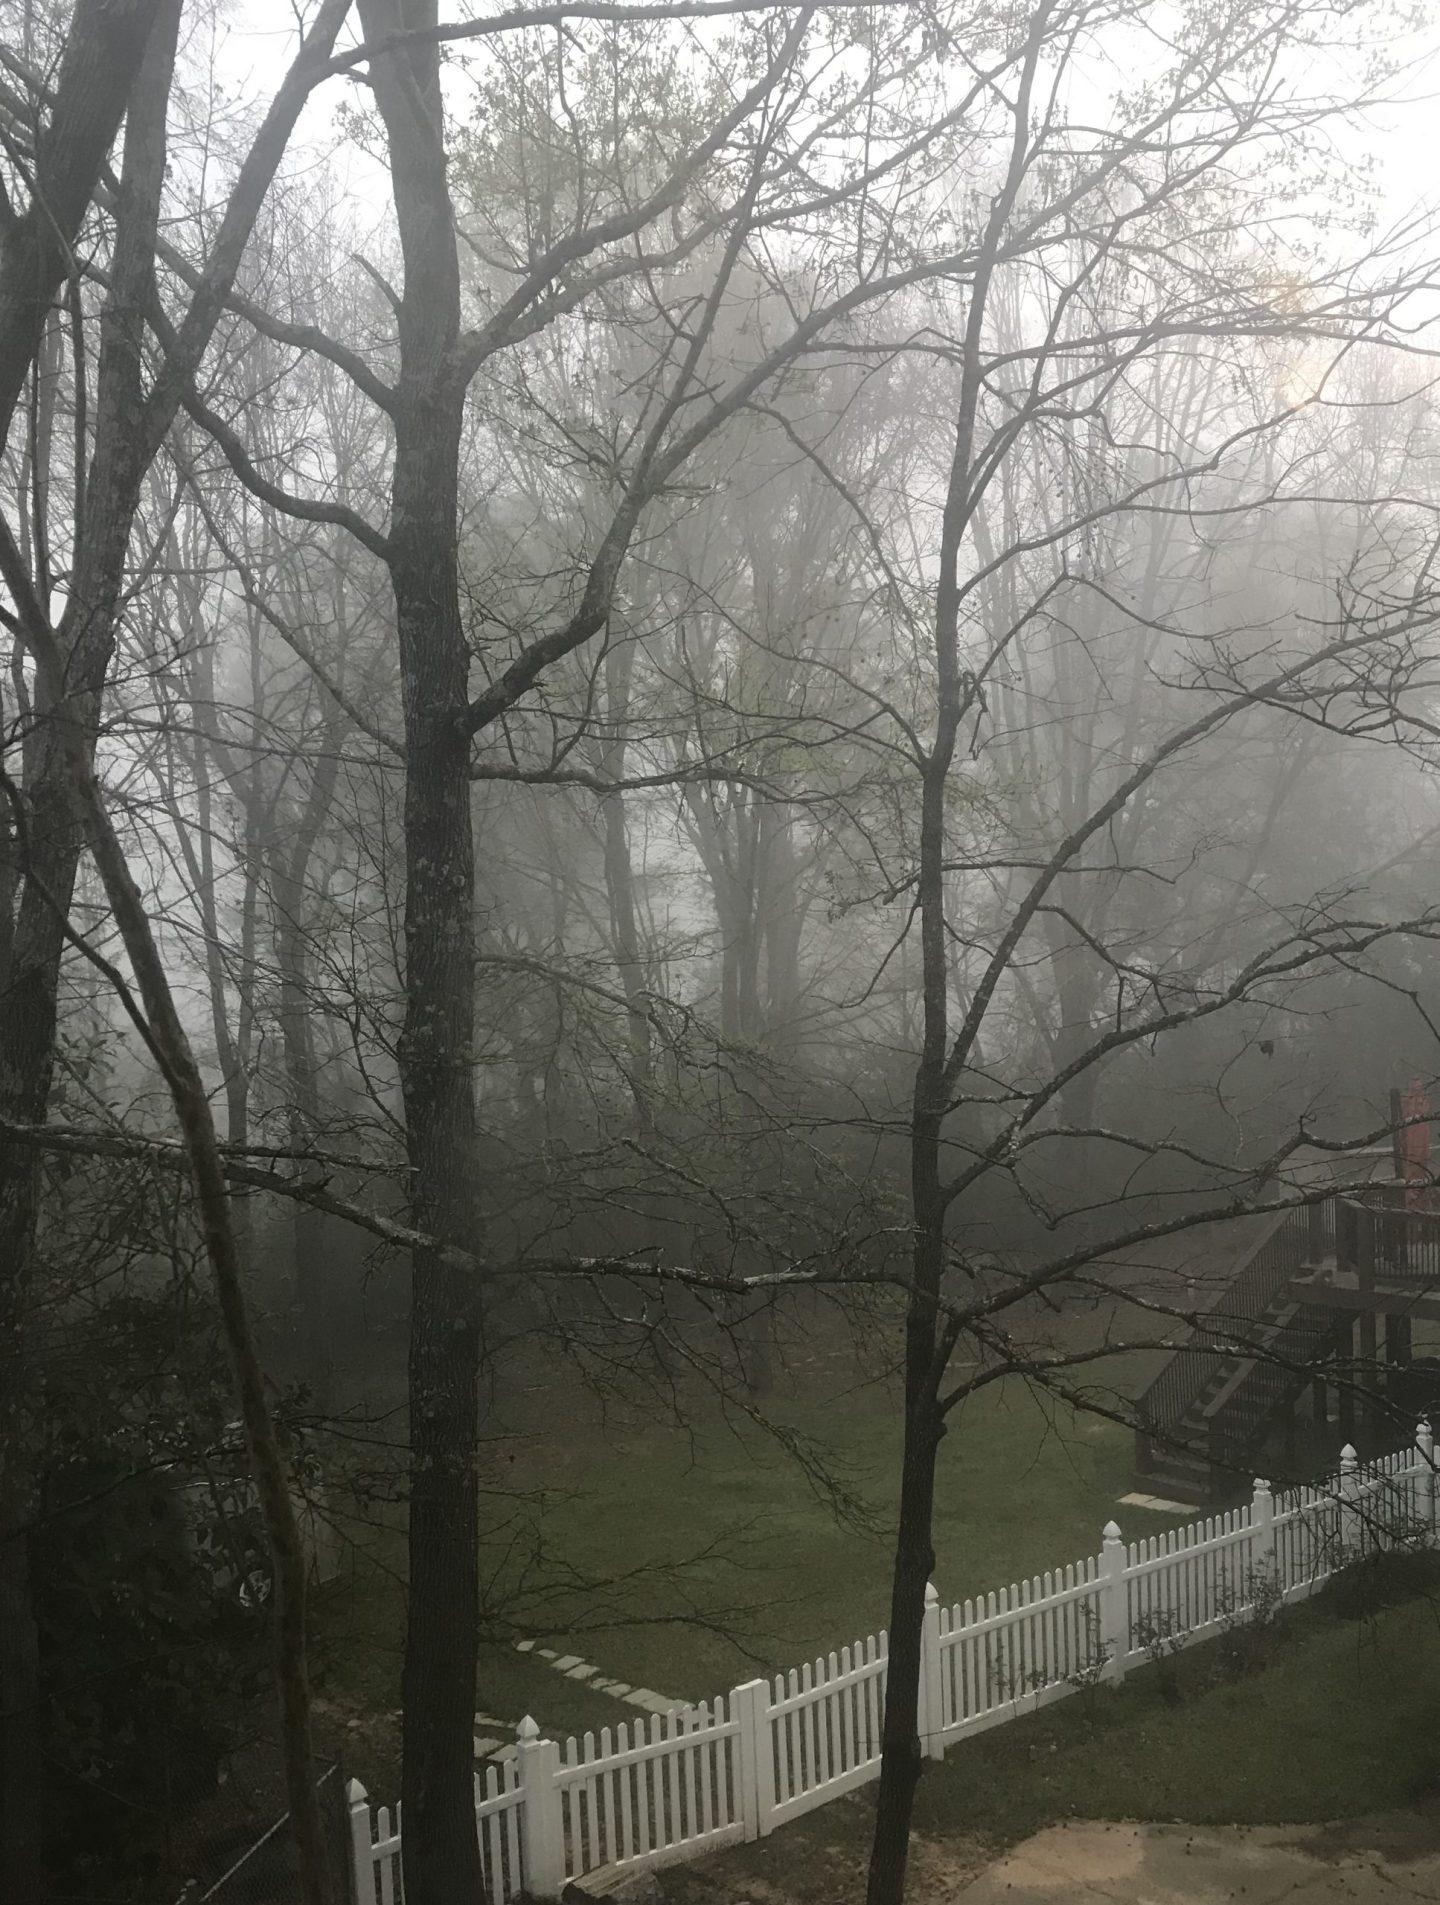 misty tree scape